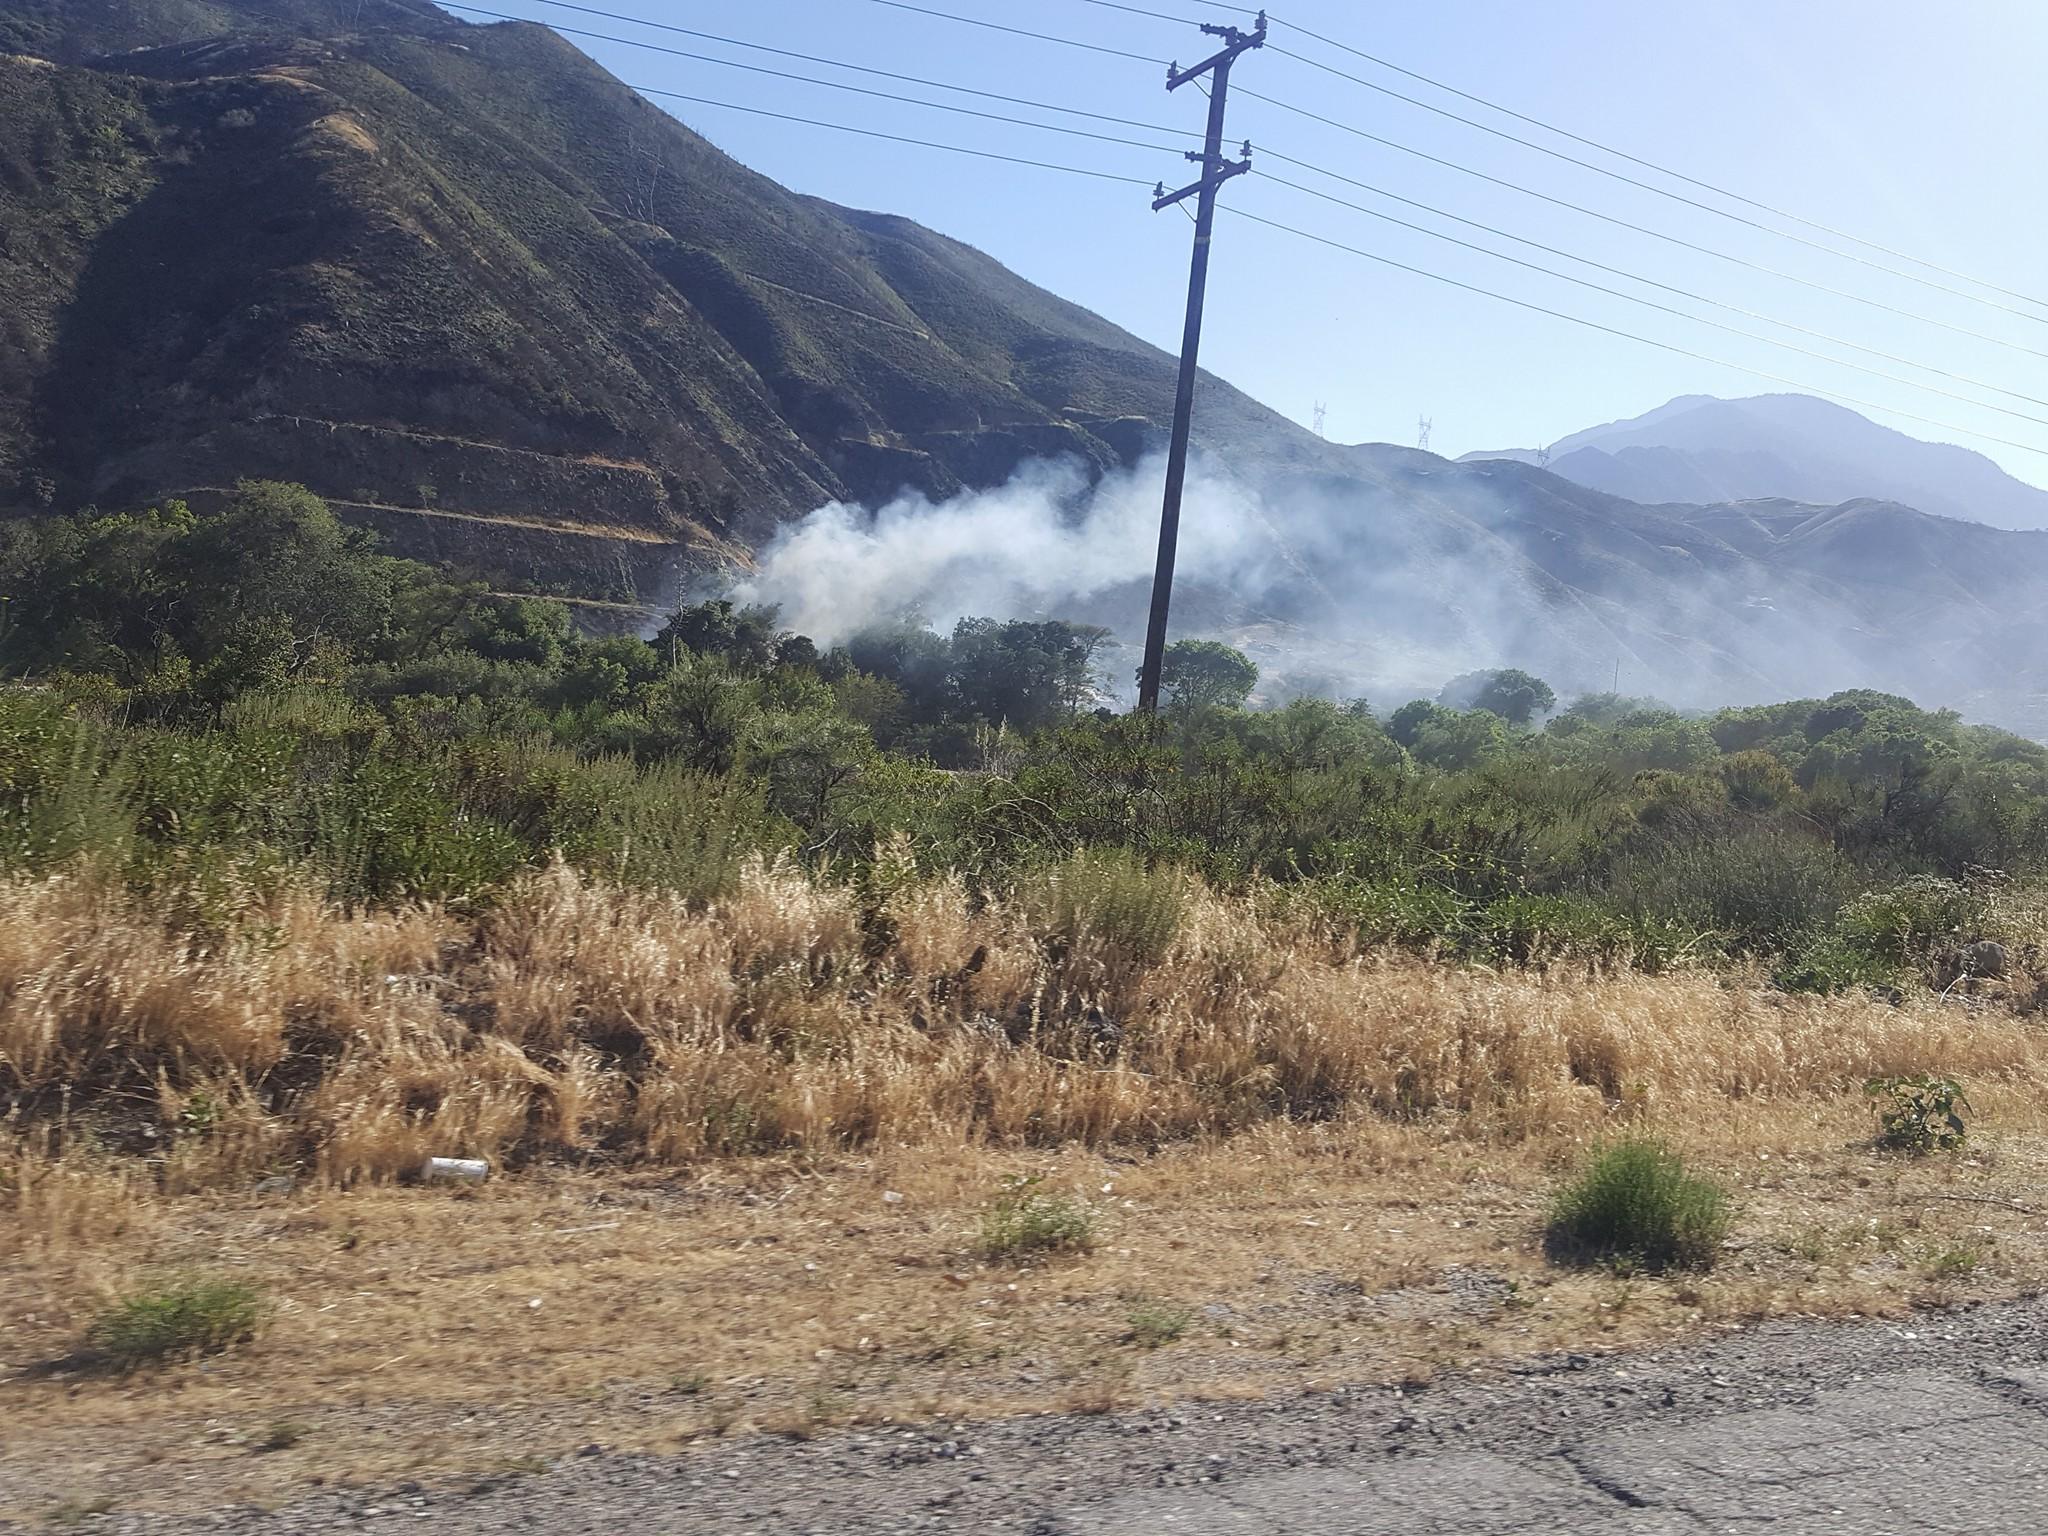 Brush fire burning off Cajon Blvd. (photo by Gabriel Cerda)